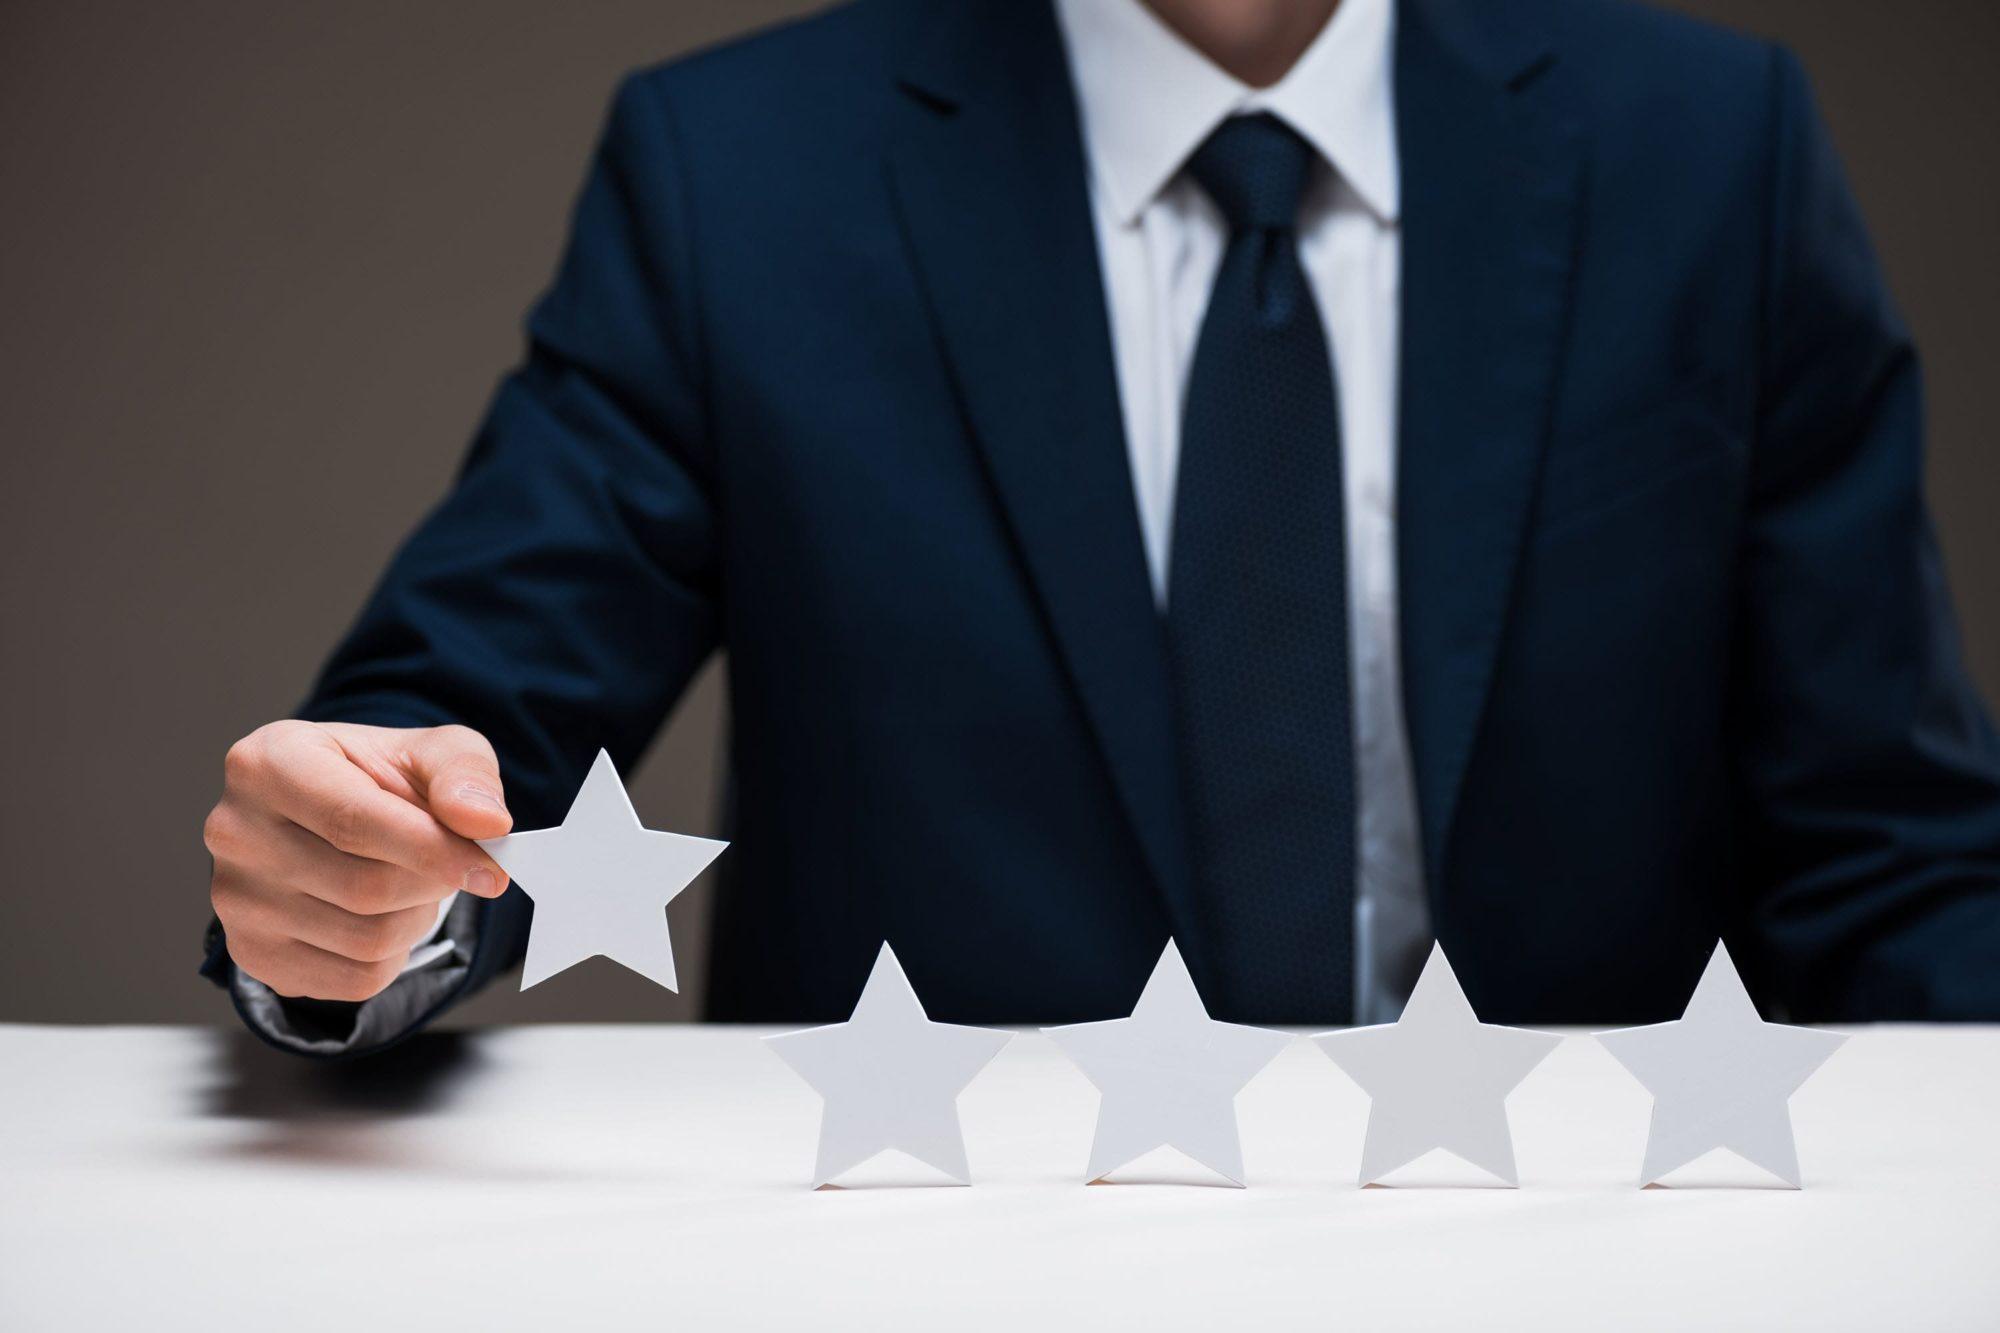 Man showing 5 stars at small business awards.